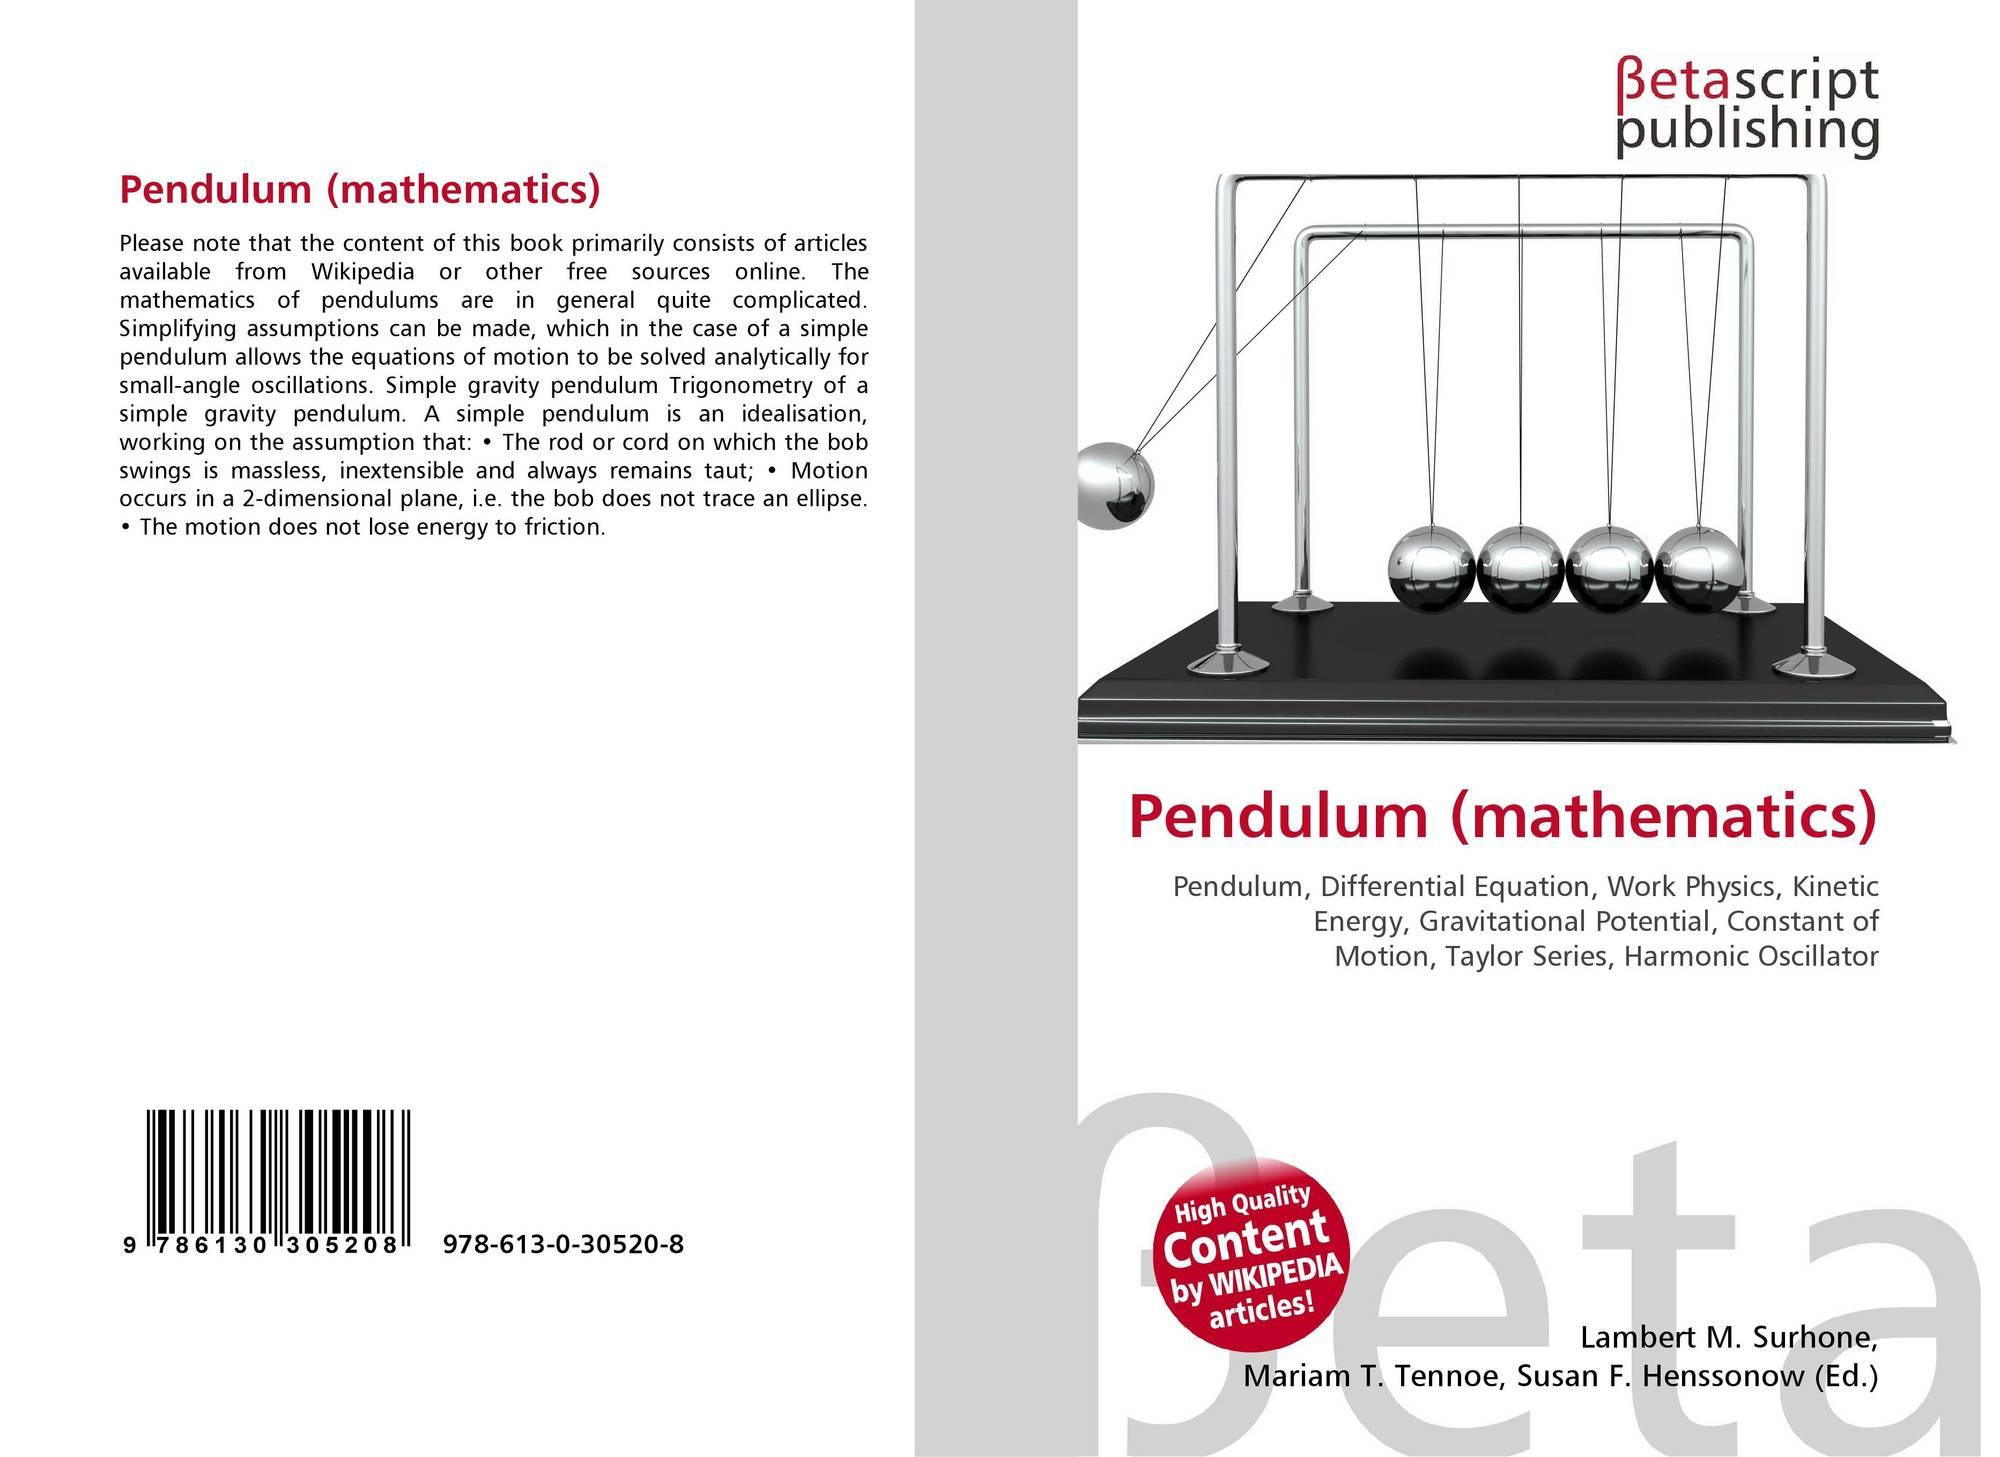 Pendulum (mathematics), 978-613-0-30520-8, 6130305206